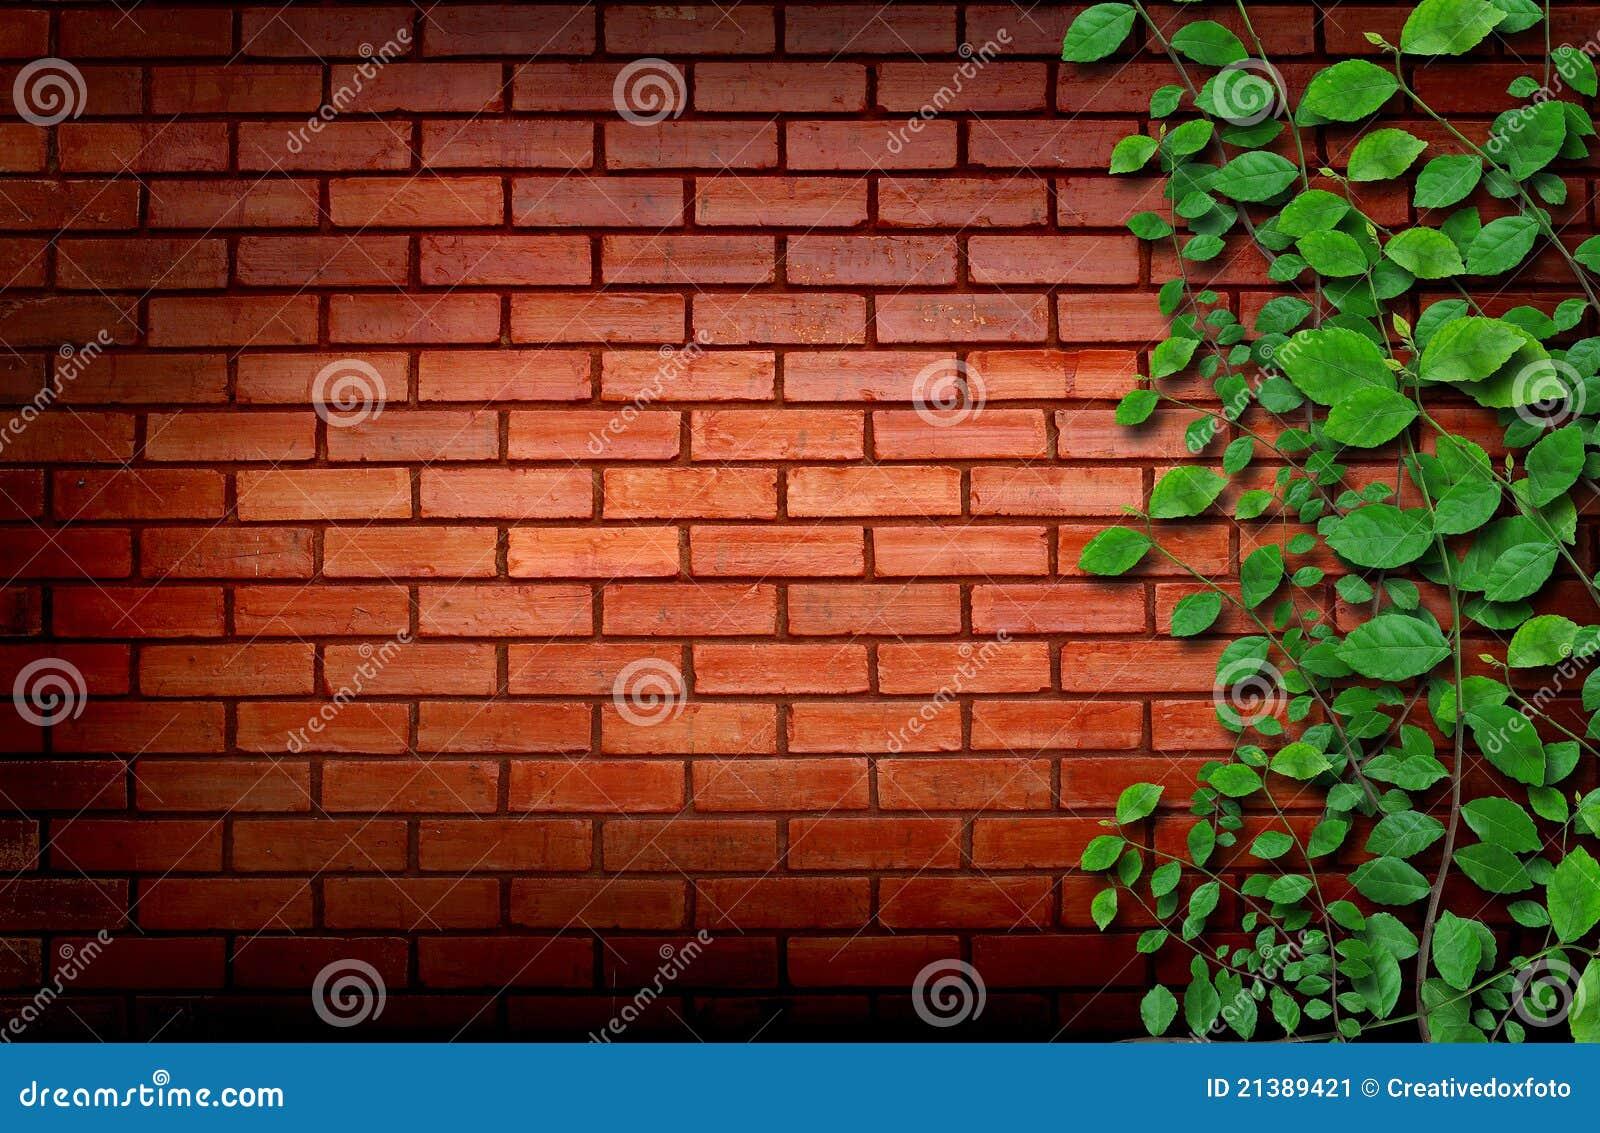 Brick Wall With Climbing Plants Stock Image